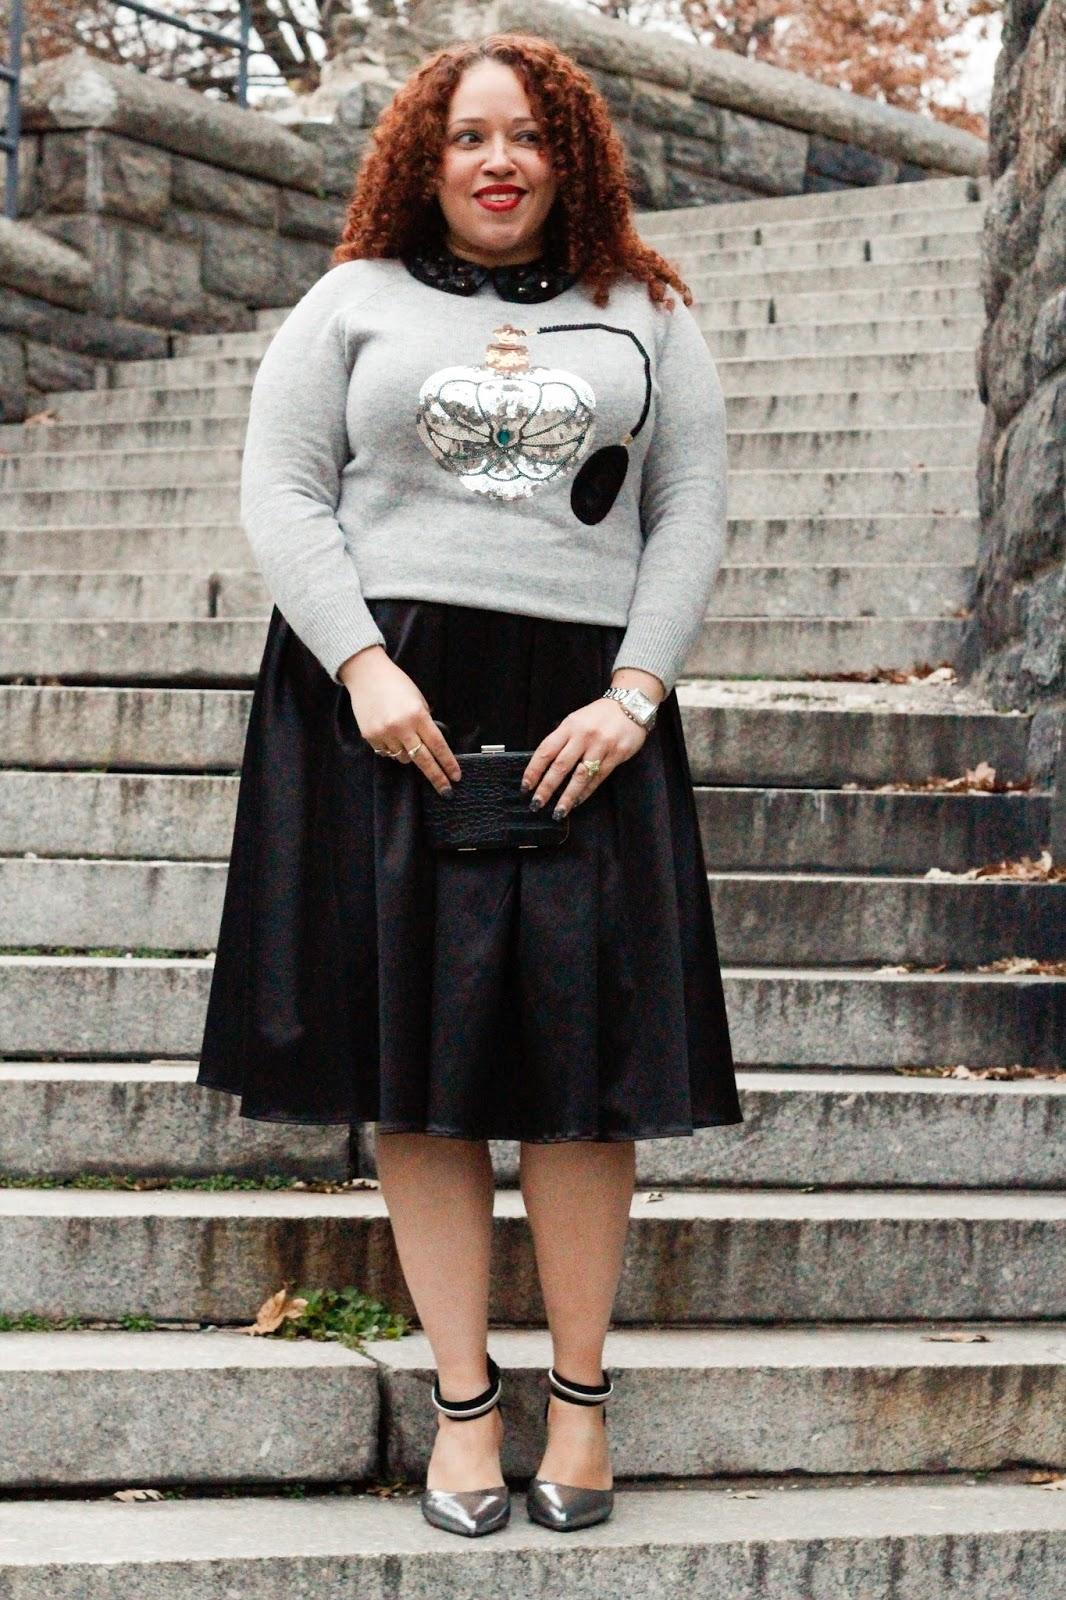 e39d01d733acd Sweater   Collar (similar) - H M  Skirt - Eloquii  Shoes - Lane Bryant  Purse  (similar) - Forever 21